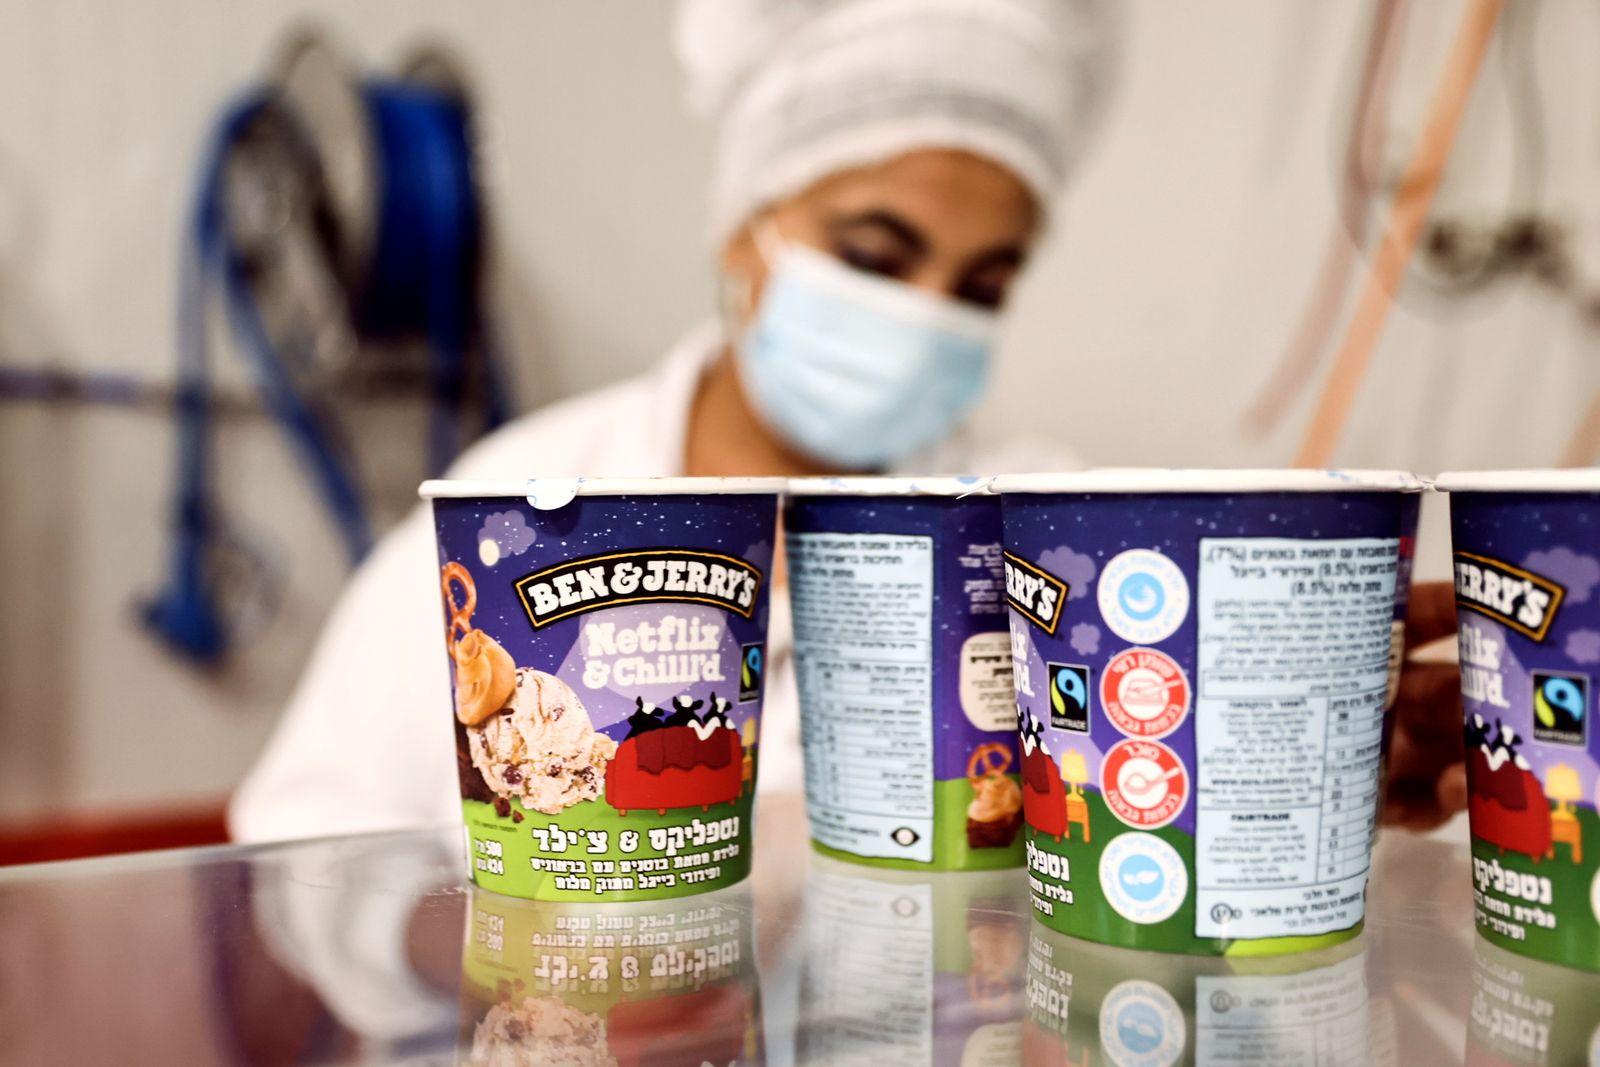 Ben & Jerry's ice-cream factory in Be'er Tuvia